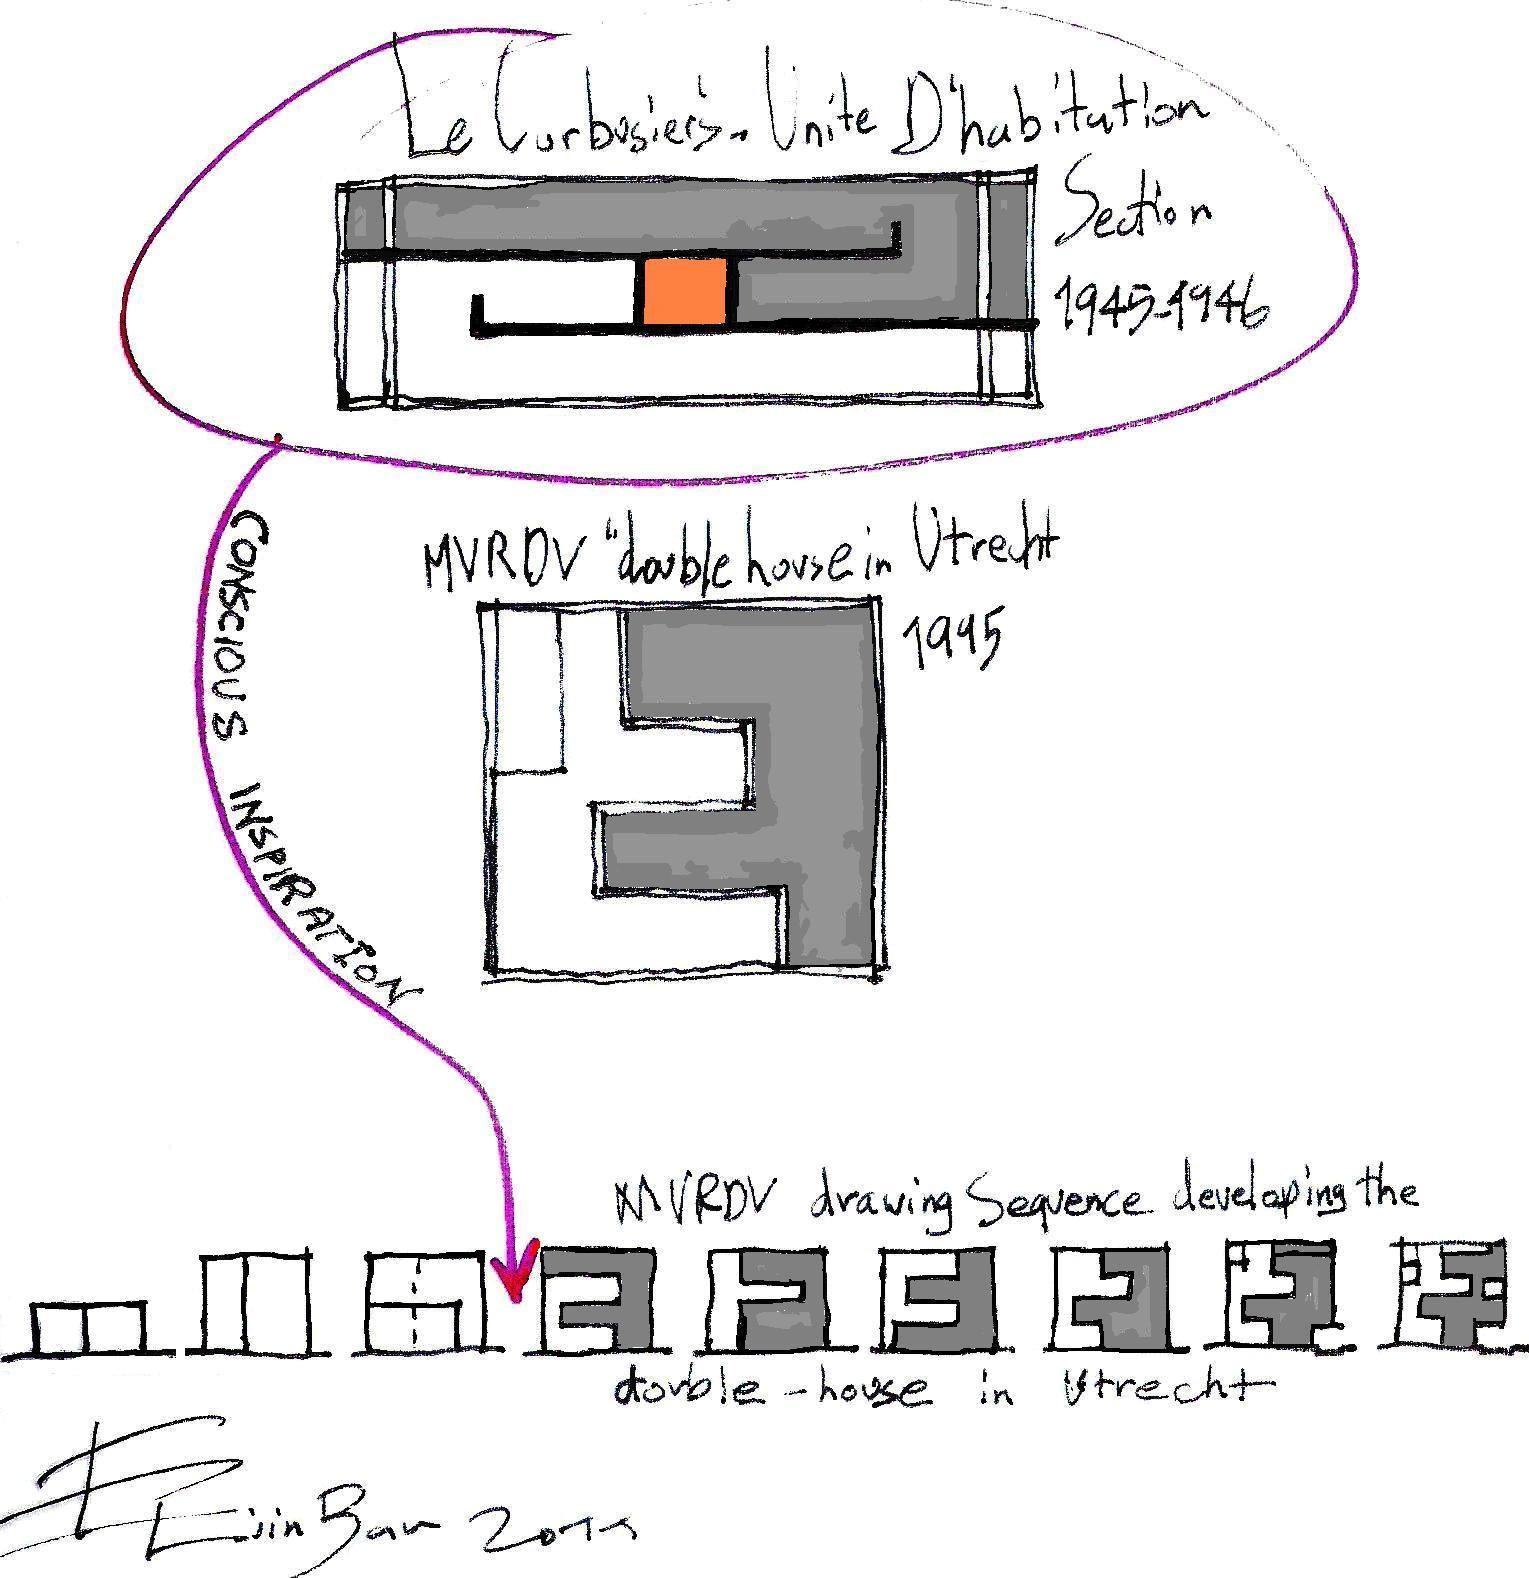 Mvrdv le corbusier and the ultimate inspiration building for Interlocking architecture concept